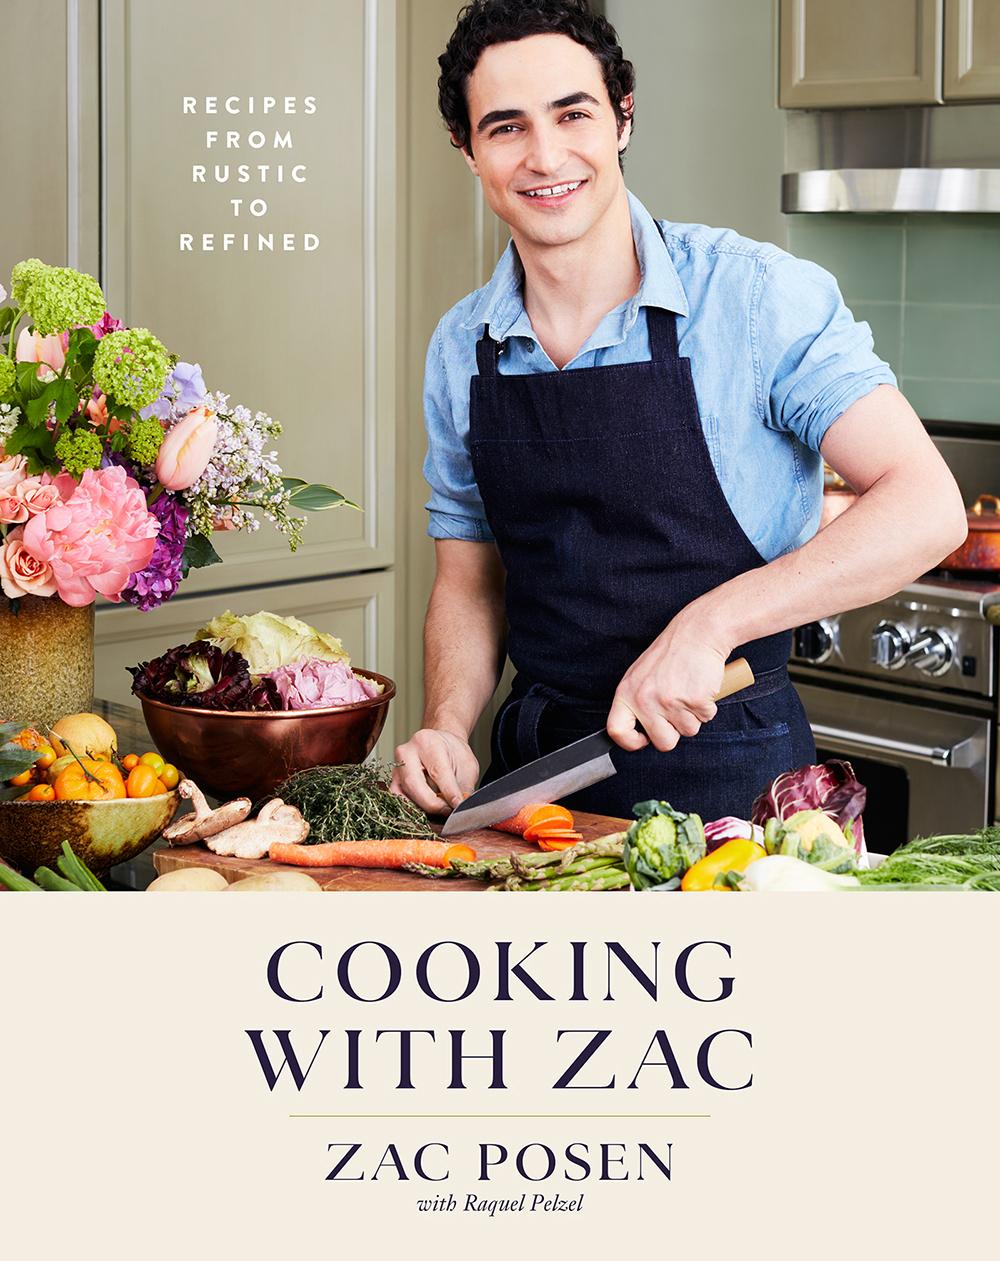 CookingwithZac.jpg